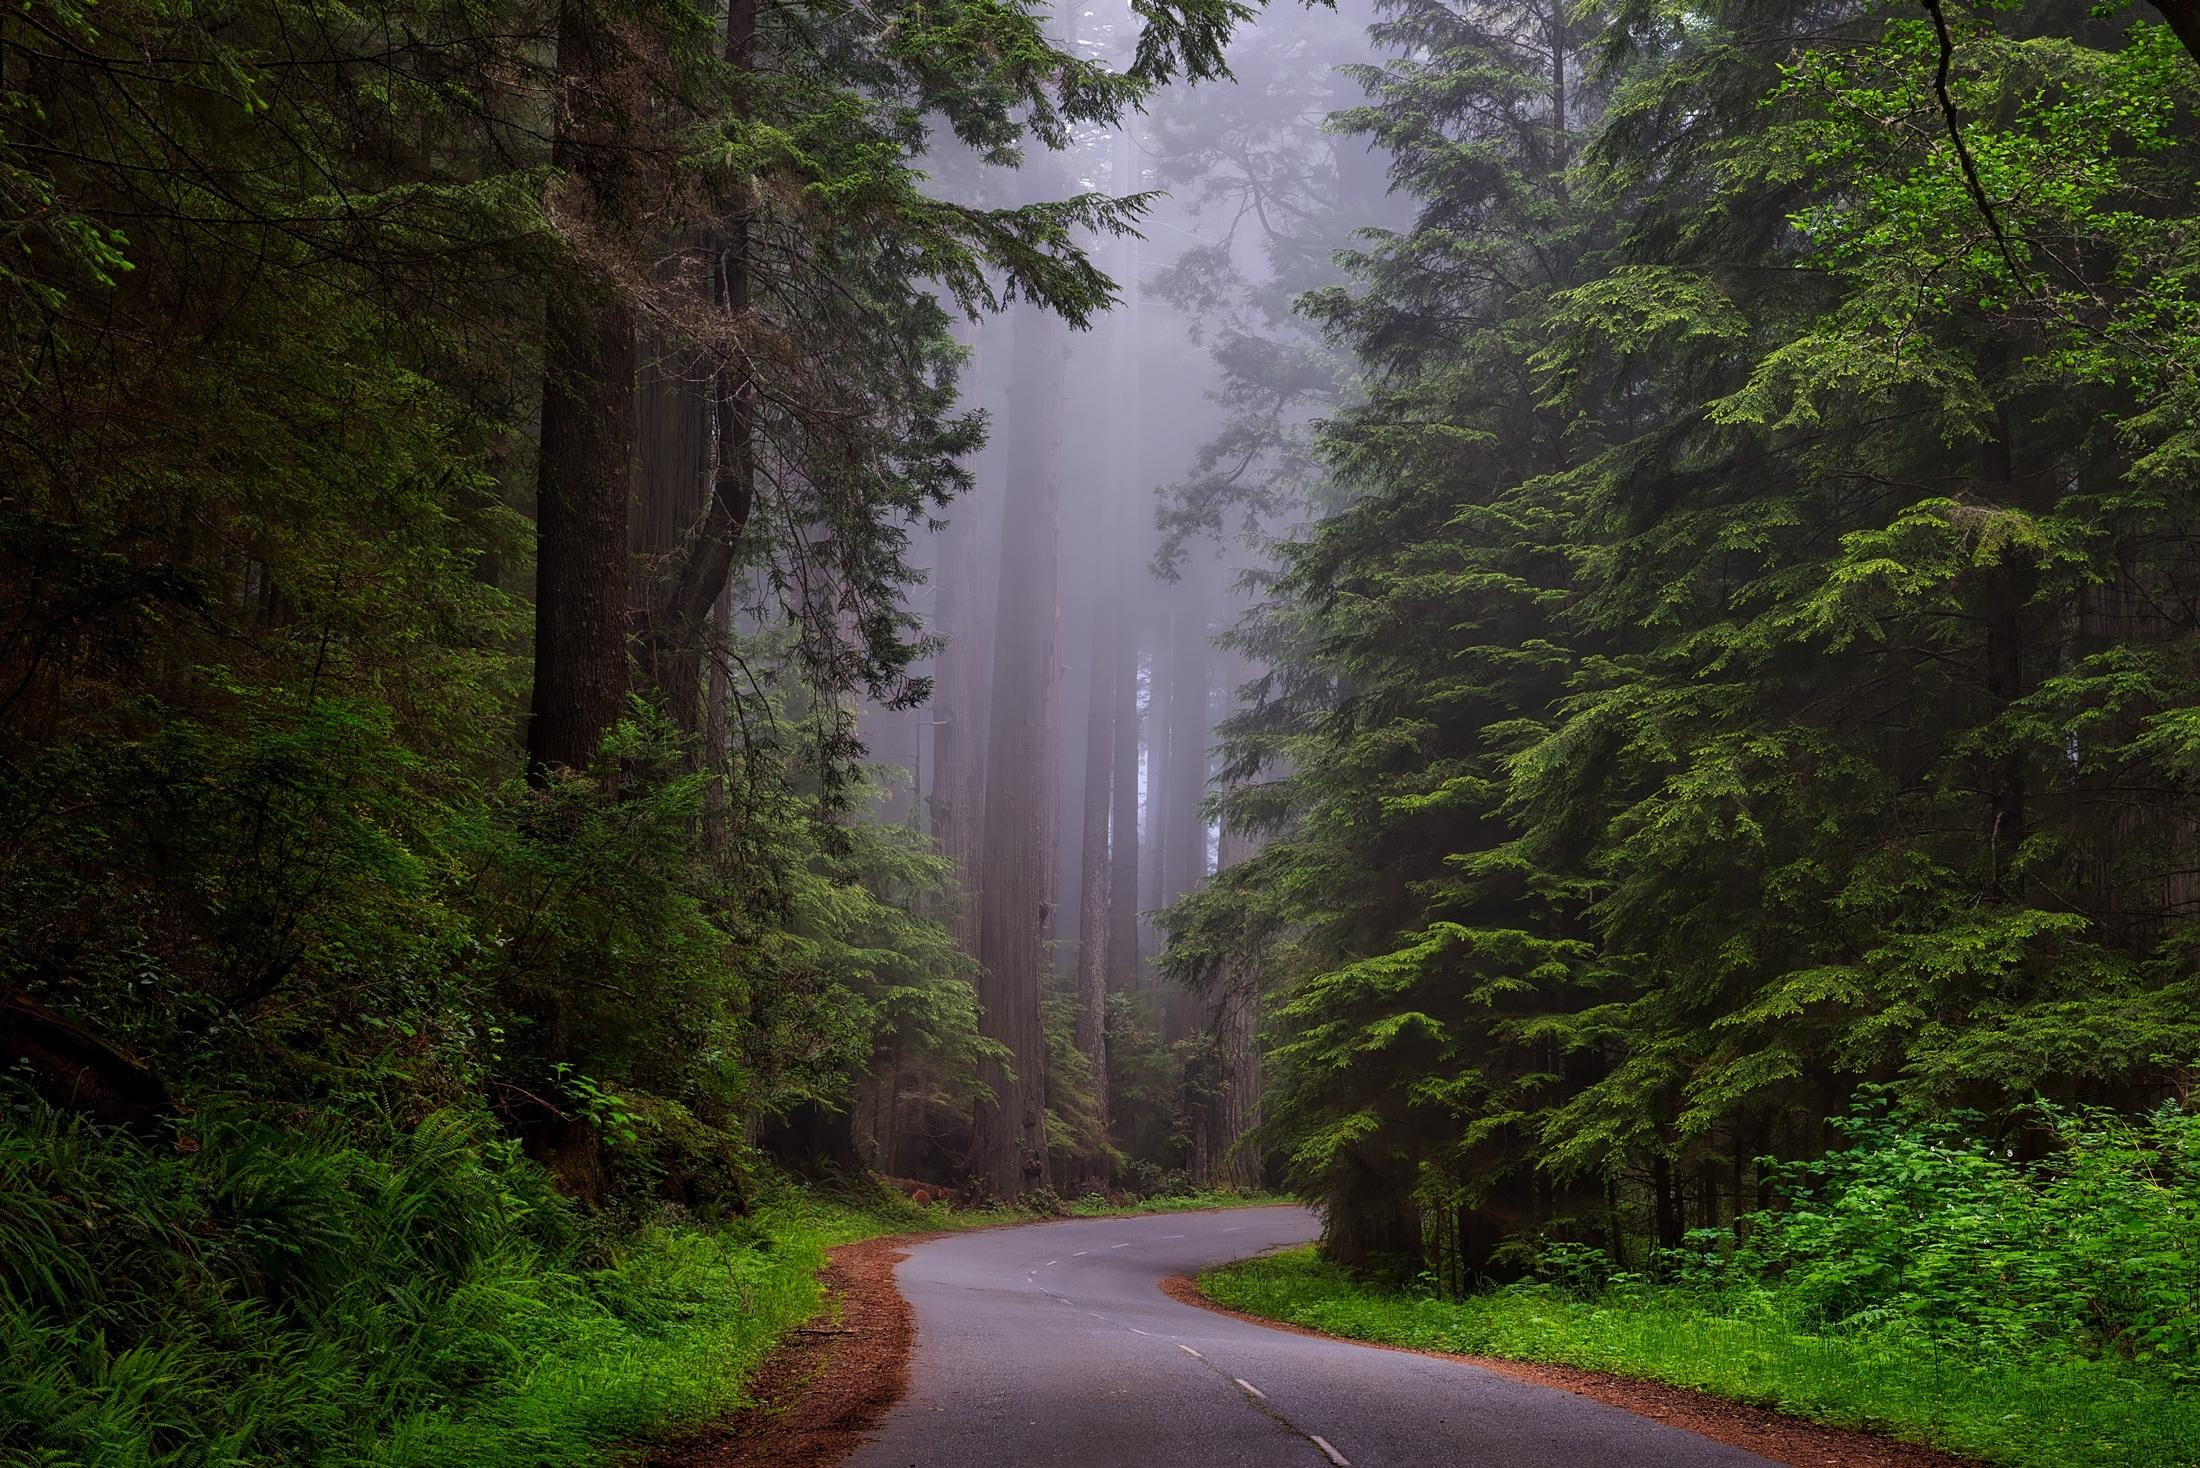 redwood-national-park-1587301.jpg